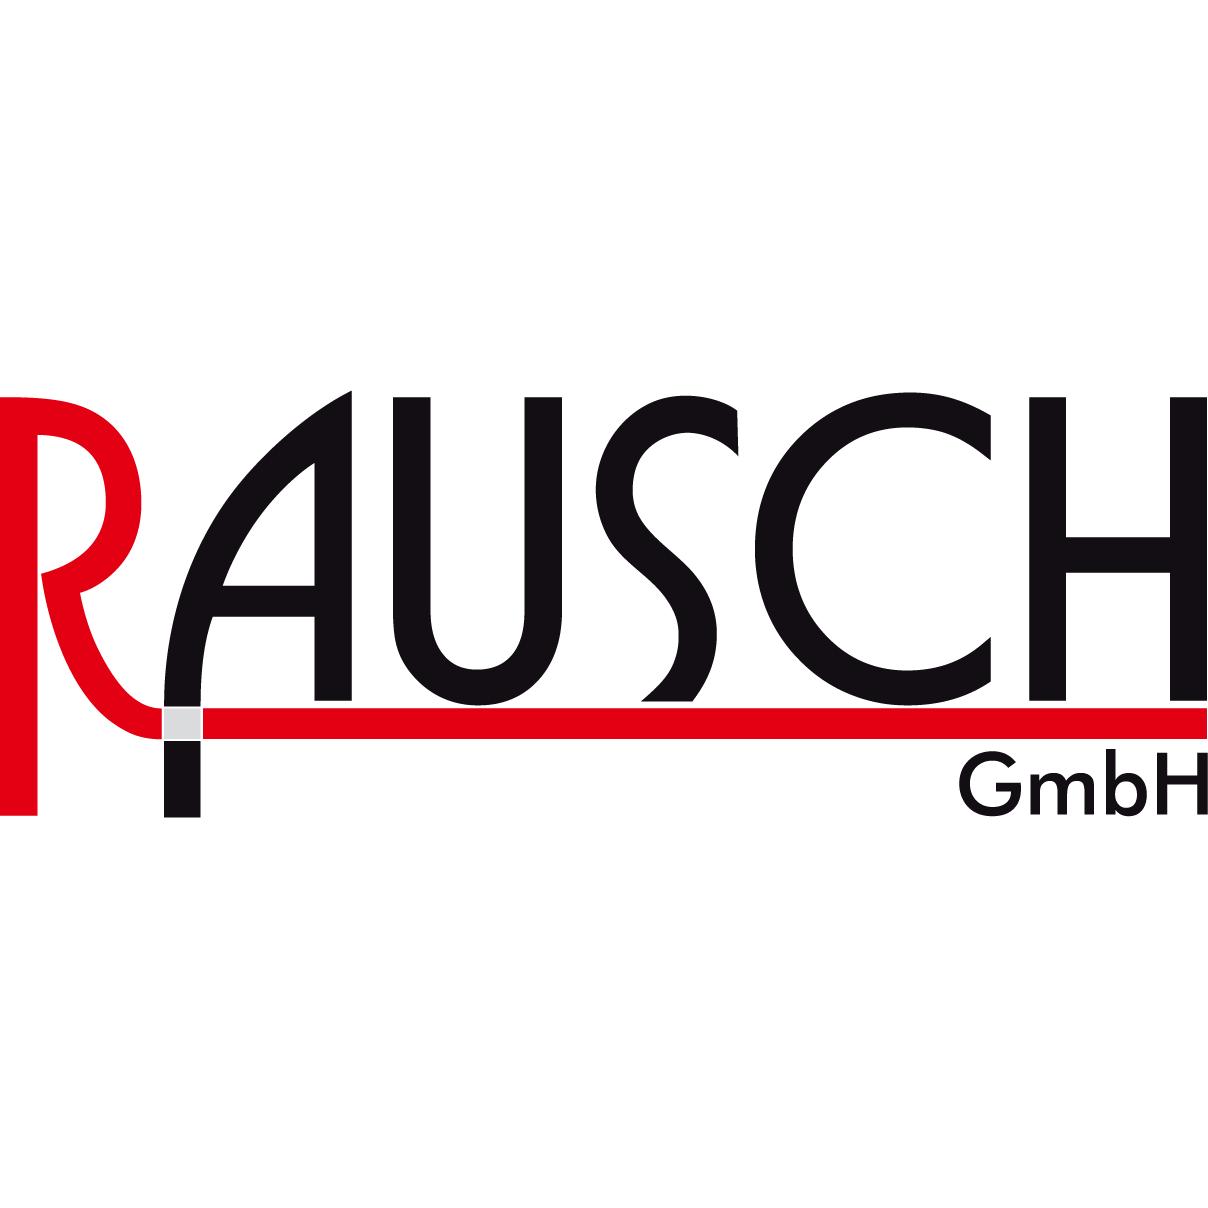 Rausch GmbH